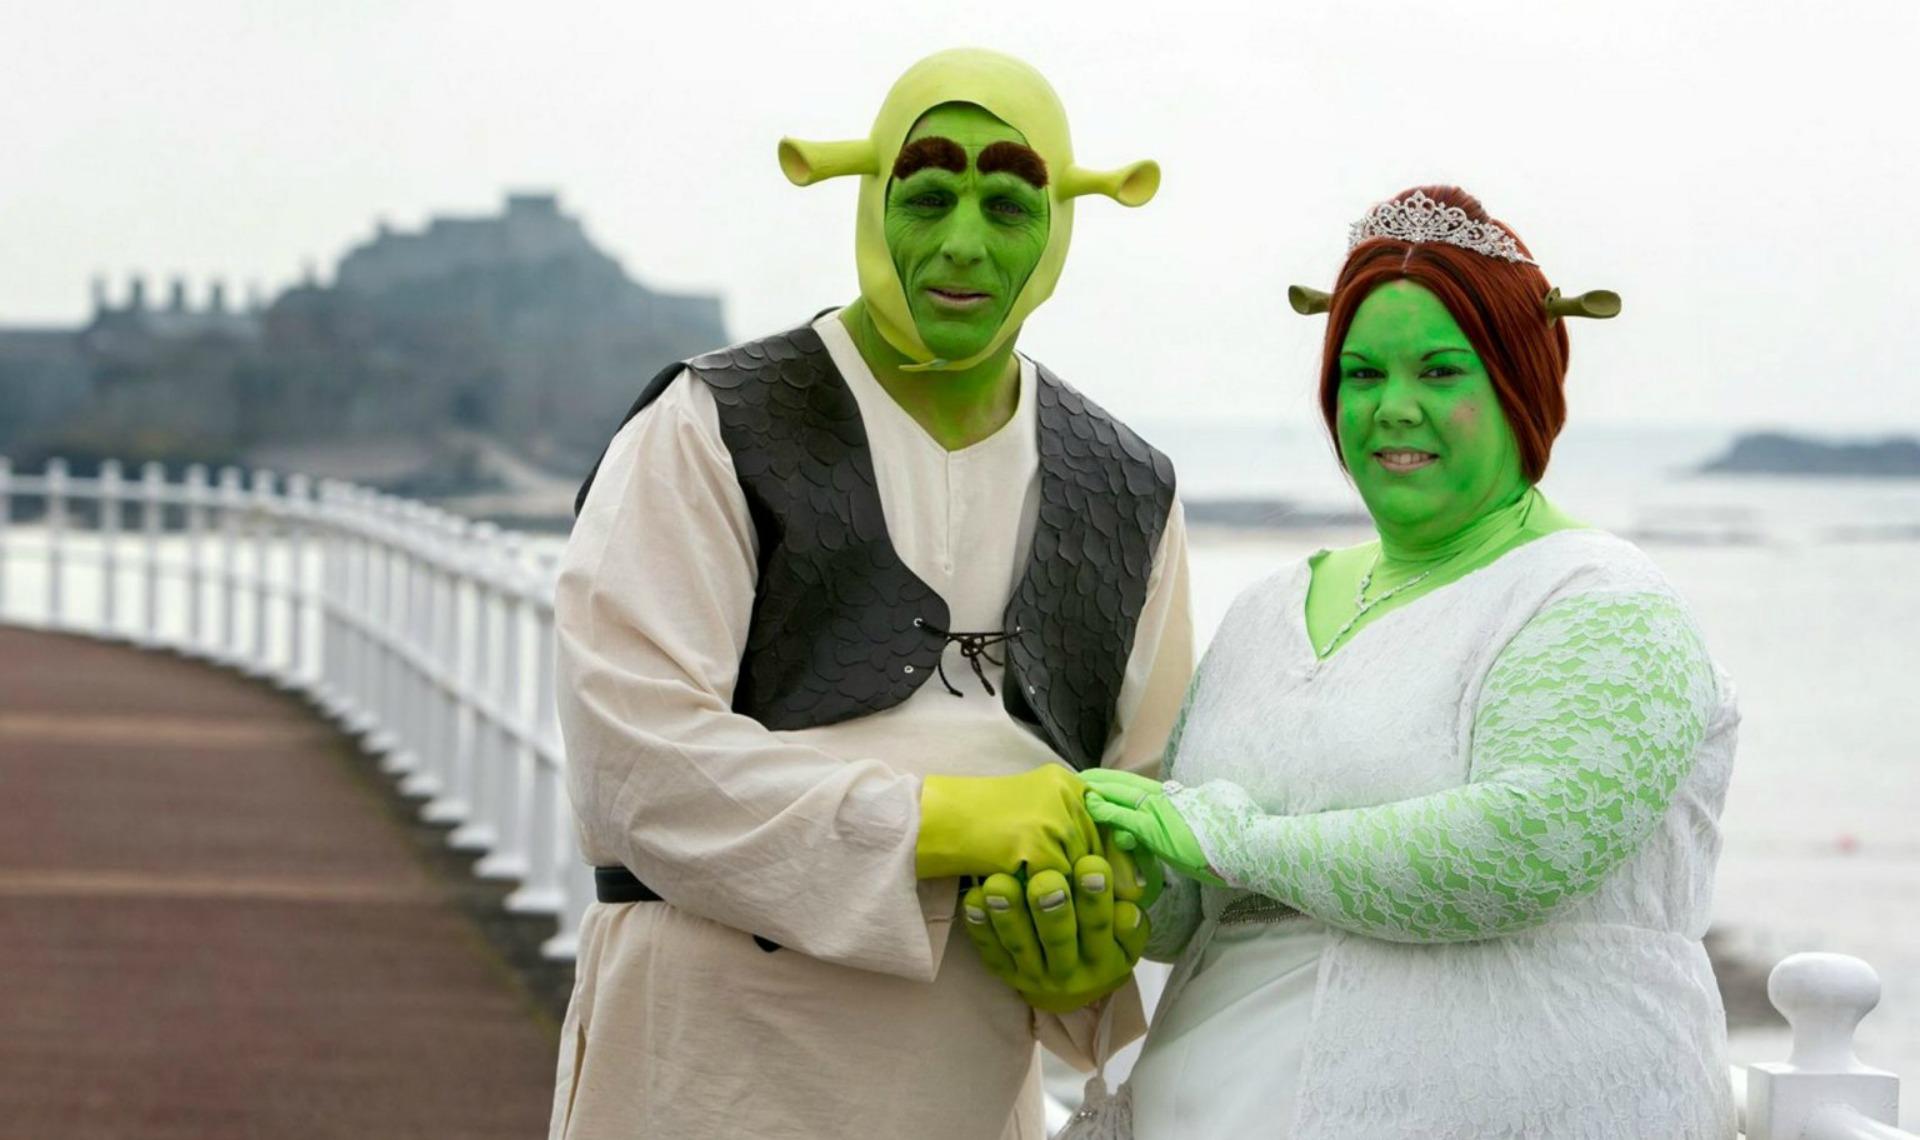 mariage shrek